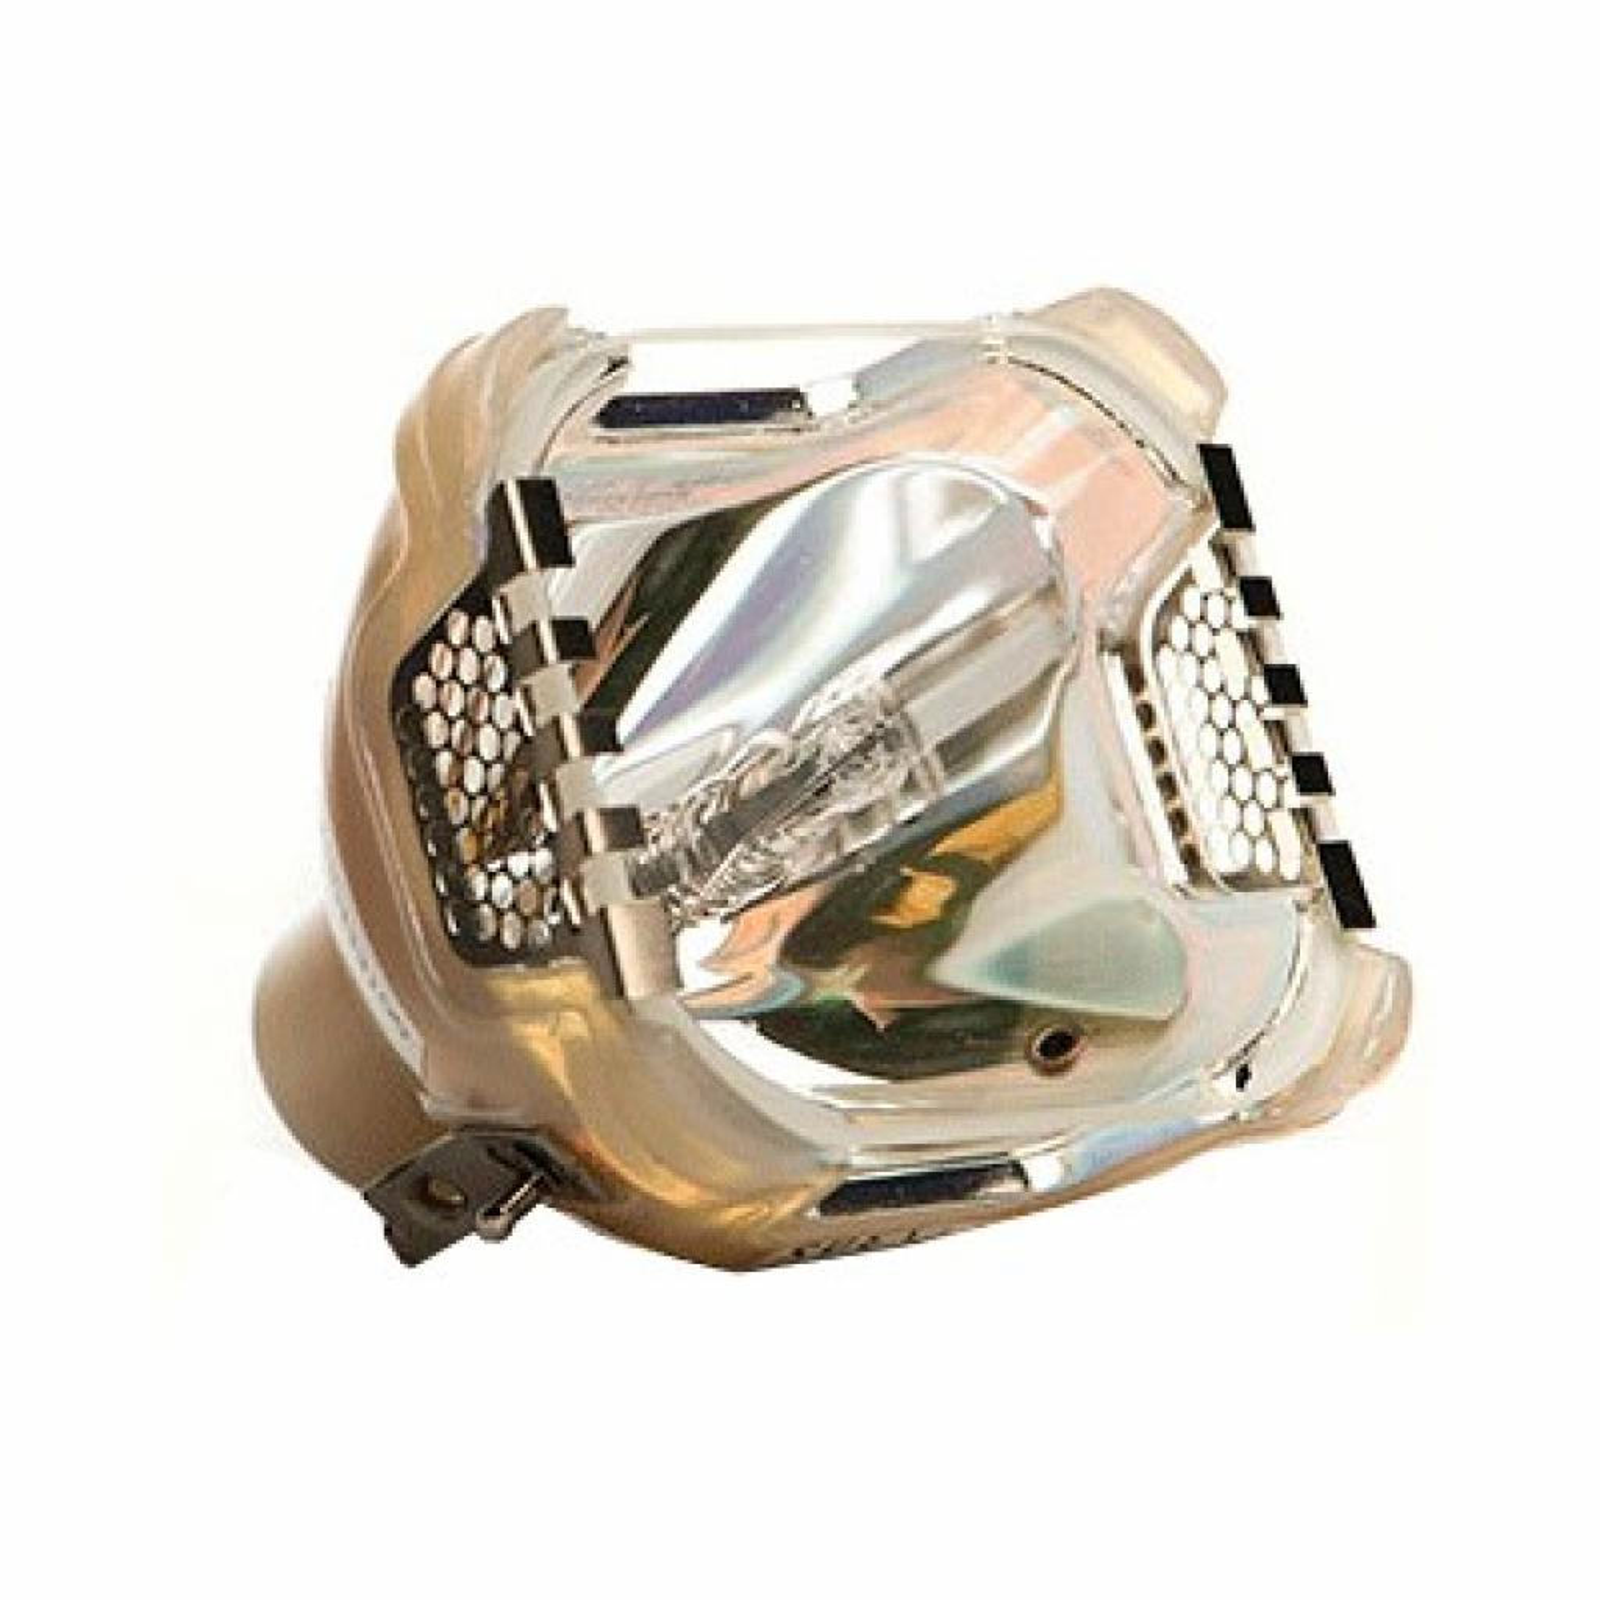 Лампа проектора BENQ Лампа до BENQ W1060 (5J.J5405.001)